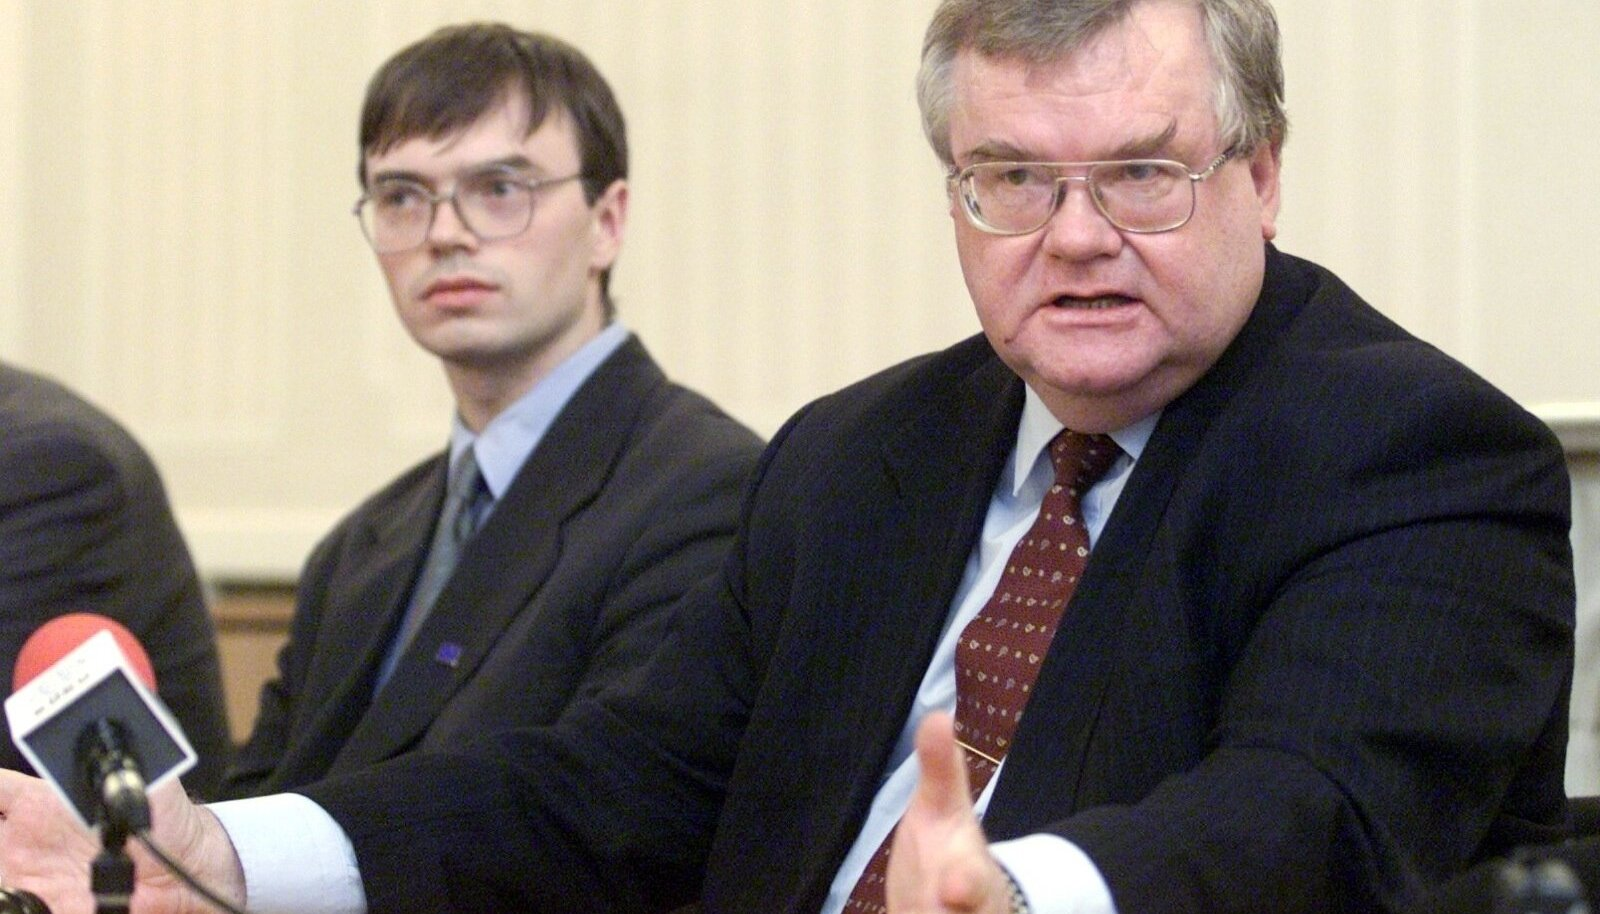 Sven Mikser, Edgar Savisaar